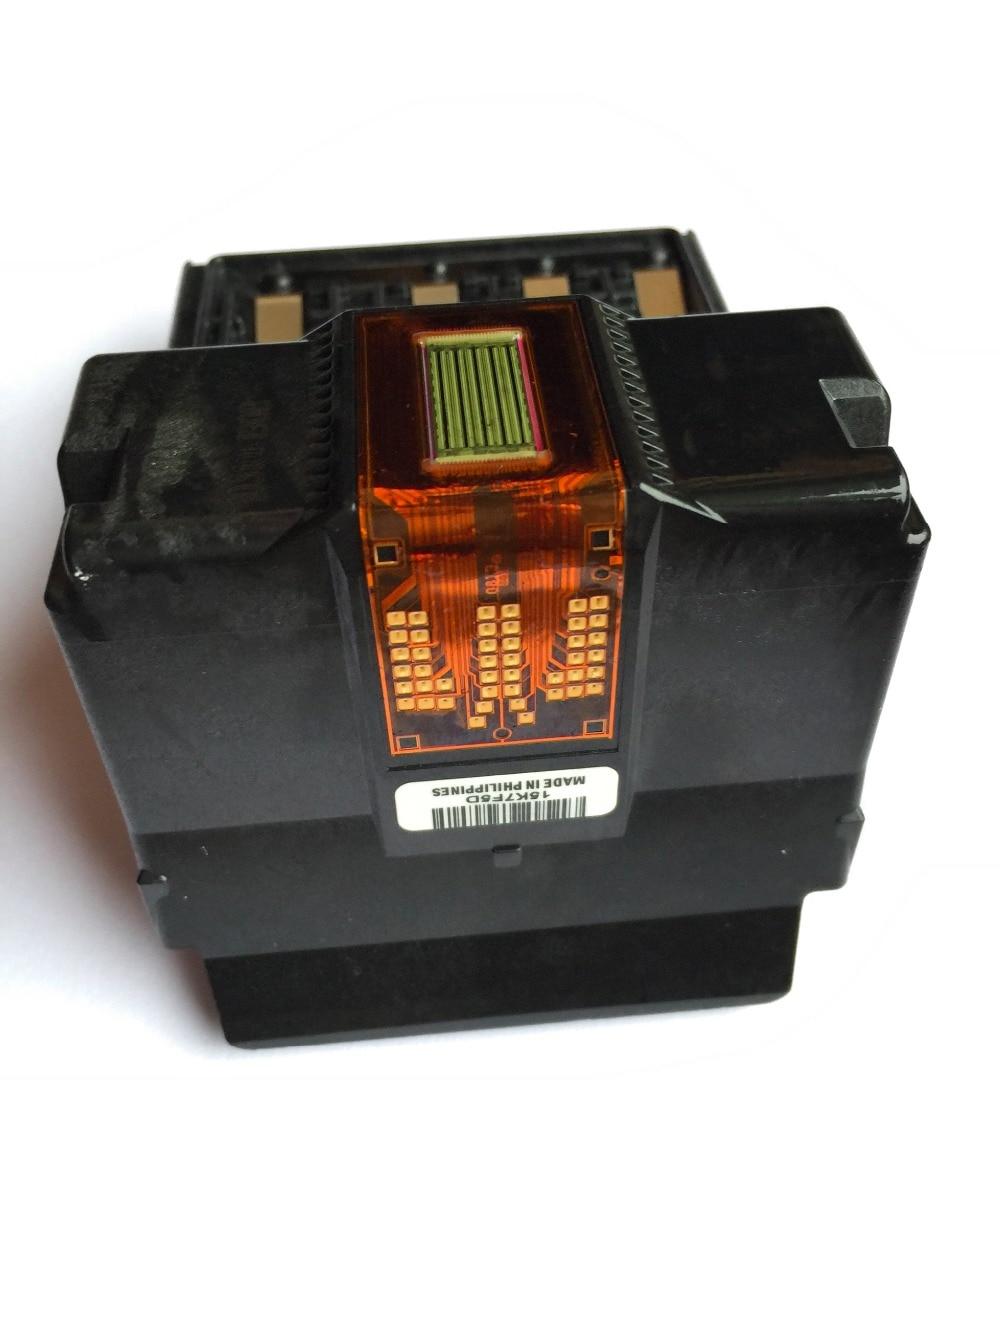 for 14N0700//14N1339 Lexmark Printhead 100Serie Pro205 Pro705 Pro901 S301 Printer